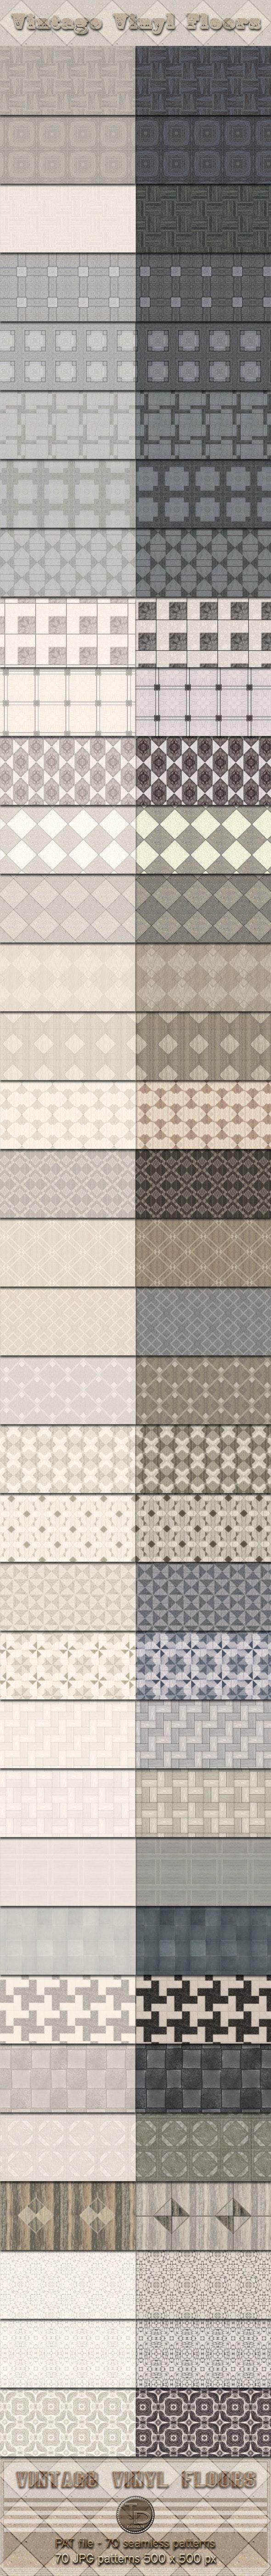 70 Vintage Vinyl Floor Seamless Patterns - Miscellaneous Textures / Fills / Patterns